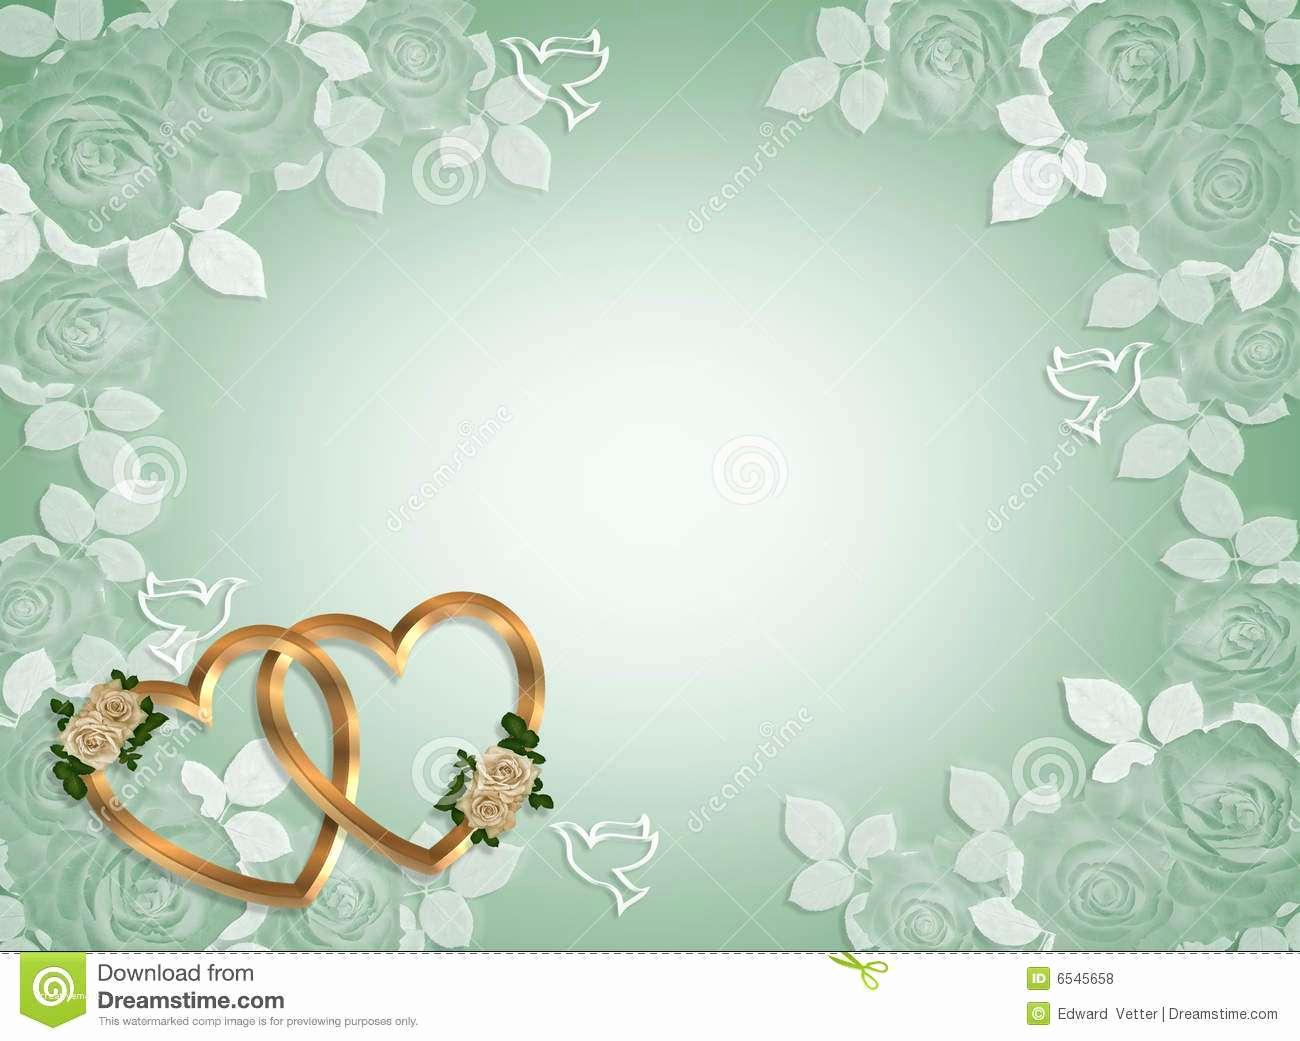 Wedding Invitation Design Templates Lovely Wedding Invitation Background Designs Free Luxury